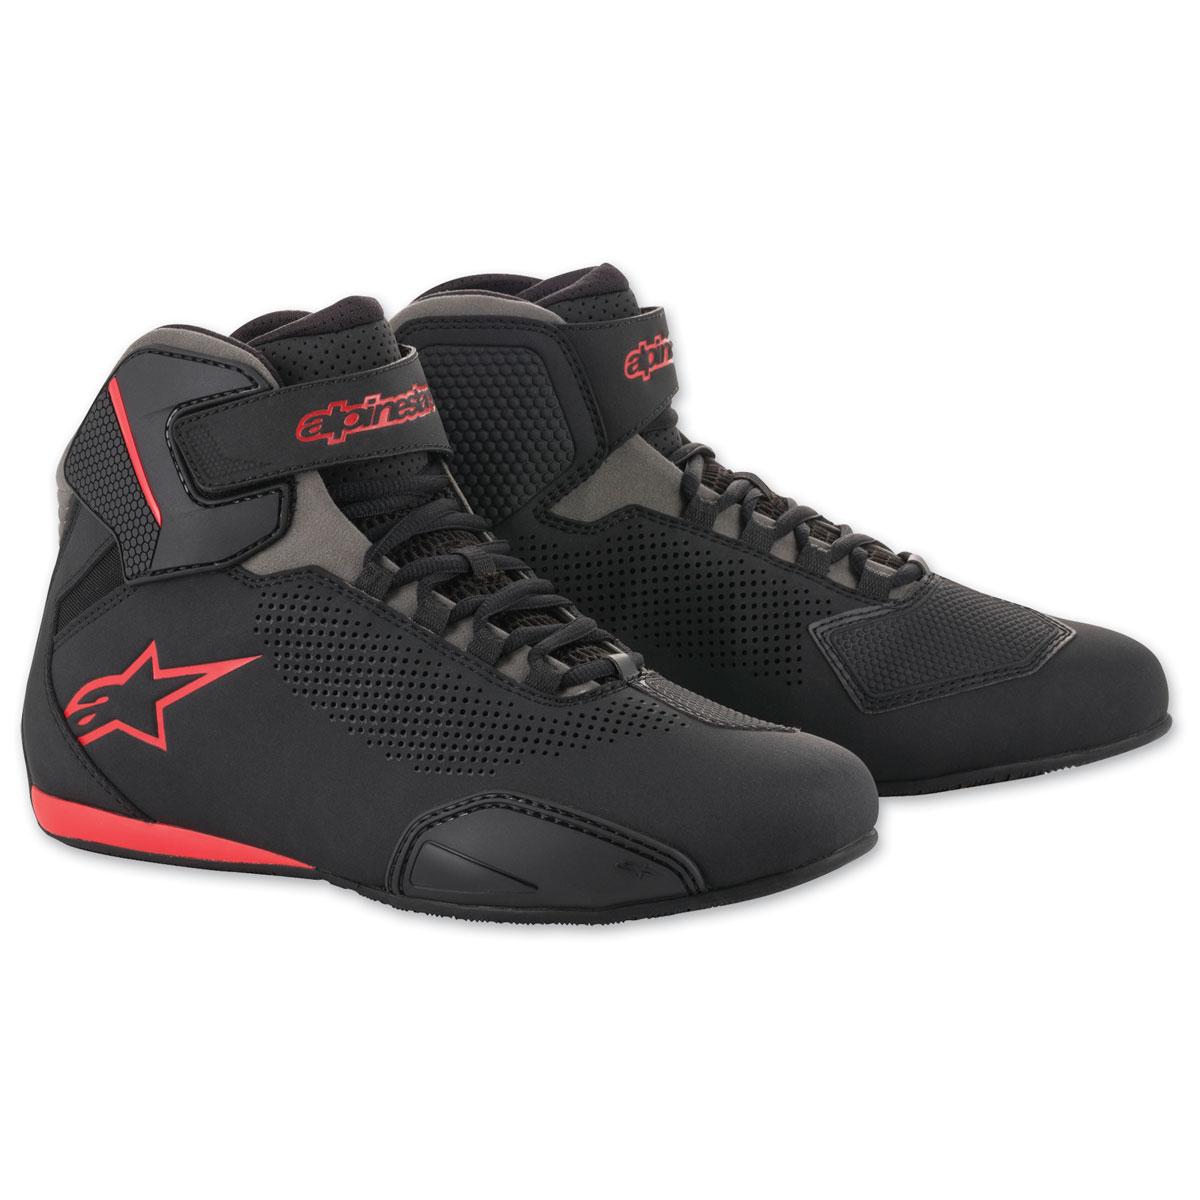 Alpinestars Men's Sektor Vented Black/Gray/Red Shoes